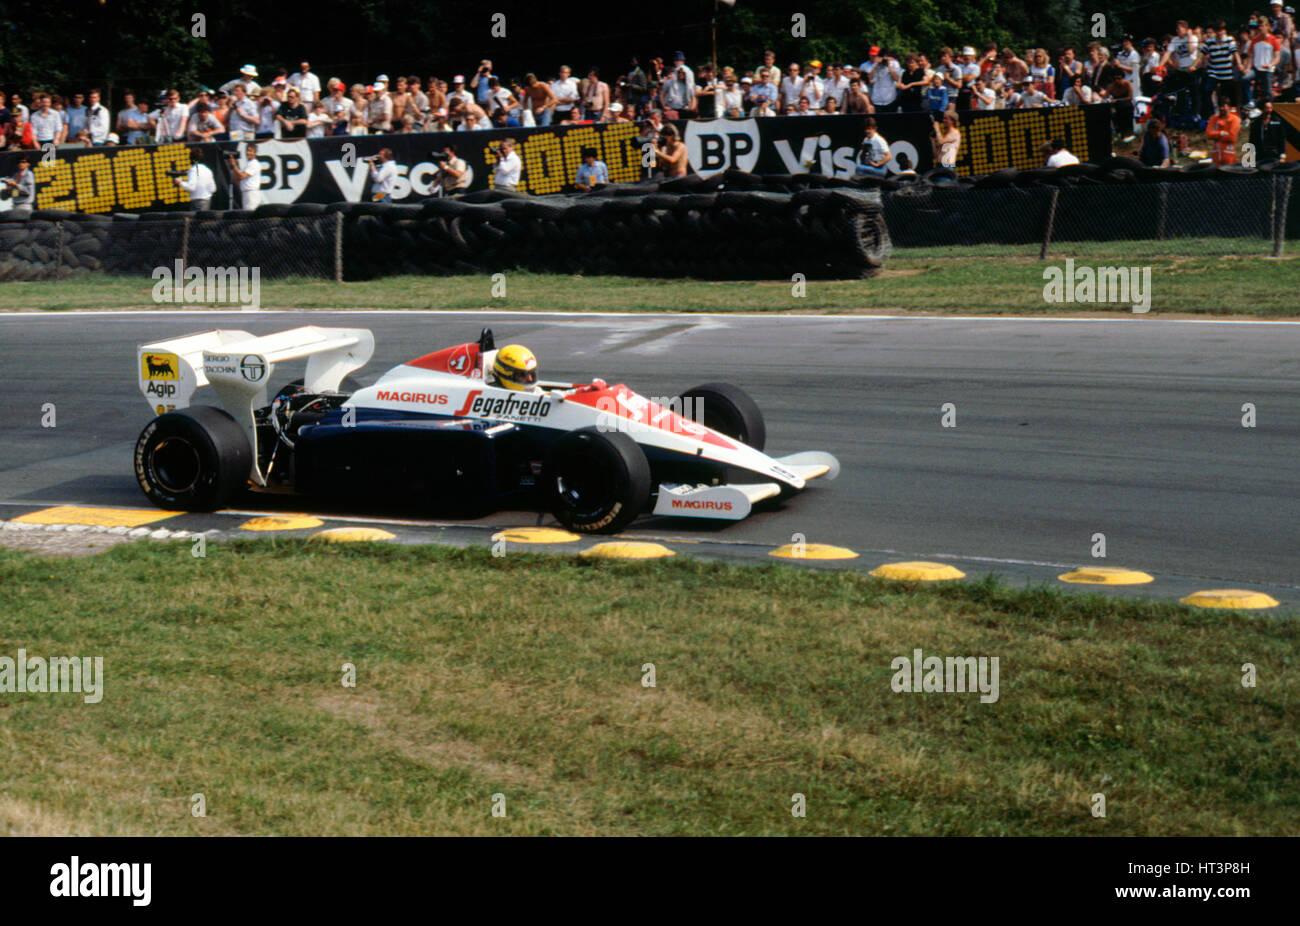 Ayrton Senna in the Toleman TG184 during 1984 British Grand Prix Brands Hatch Artist: Unknown. - Stock Image